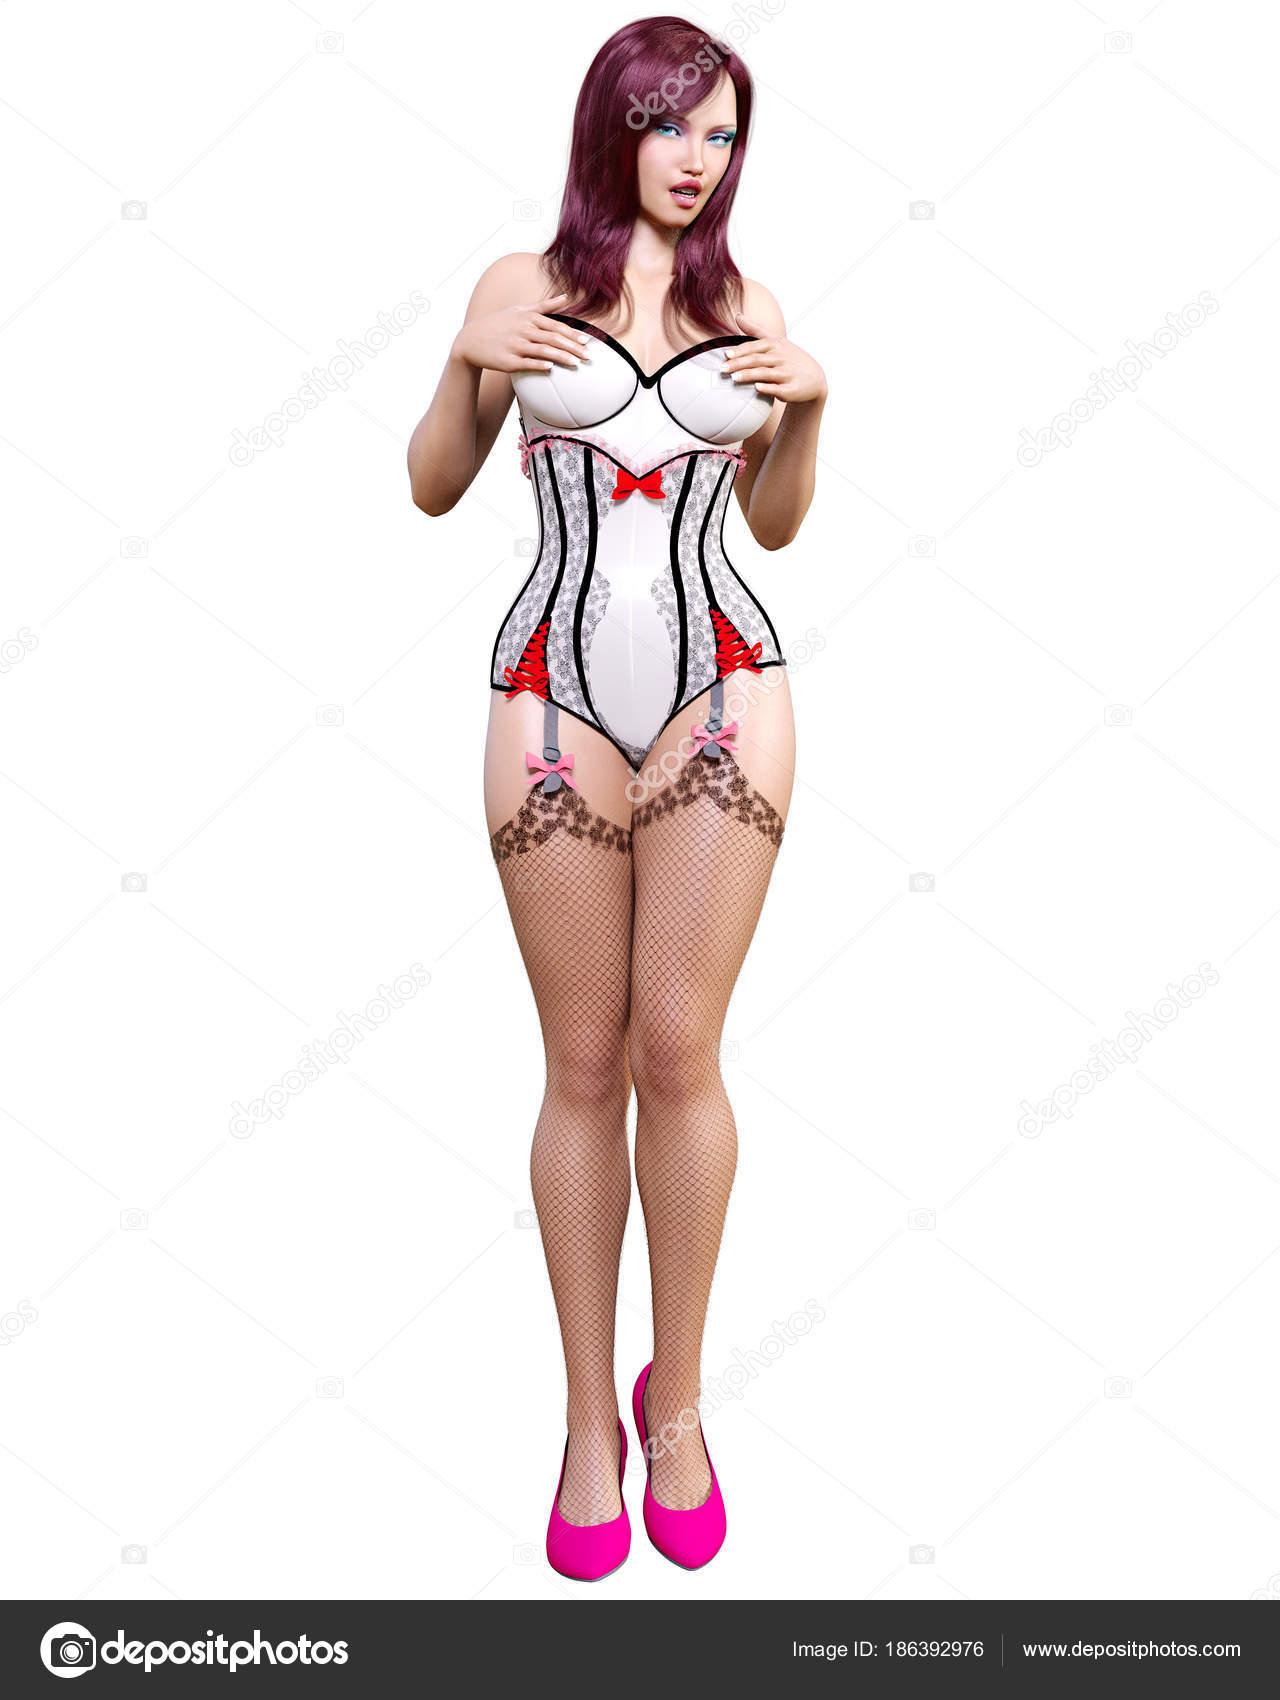 fd2066036f4 Ψηλή Γυναίκα Σέξι Λευκό Κορσέ Και Σκούρες Κάλτσες Ζαρτιέρες ...